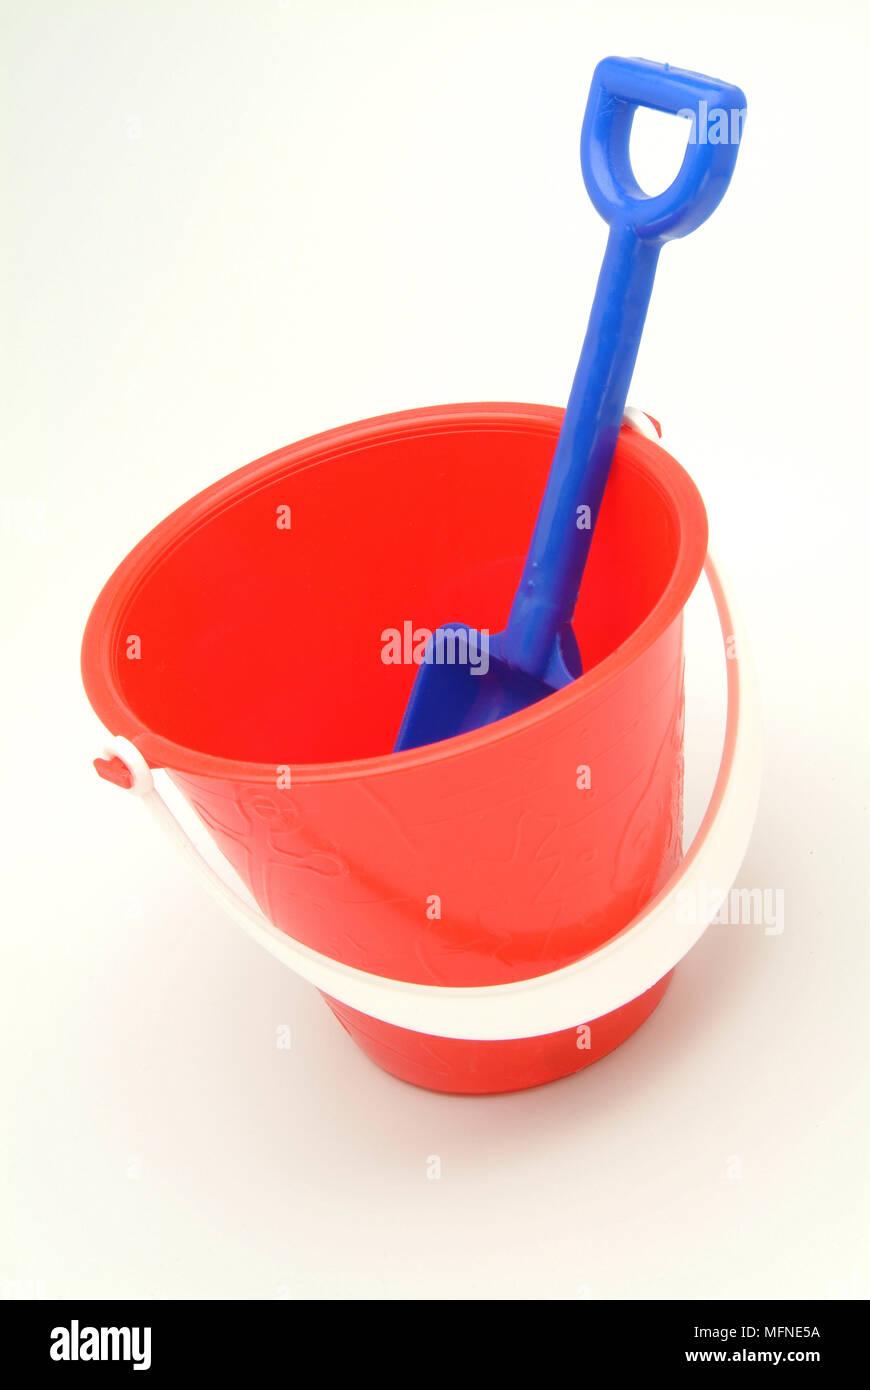 Close-up of a toy bucket et spade Ref: CRB117 10024__063 crédit obligatoire: David Barrett Sem - Allemand / Photo Stock